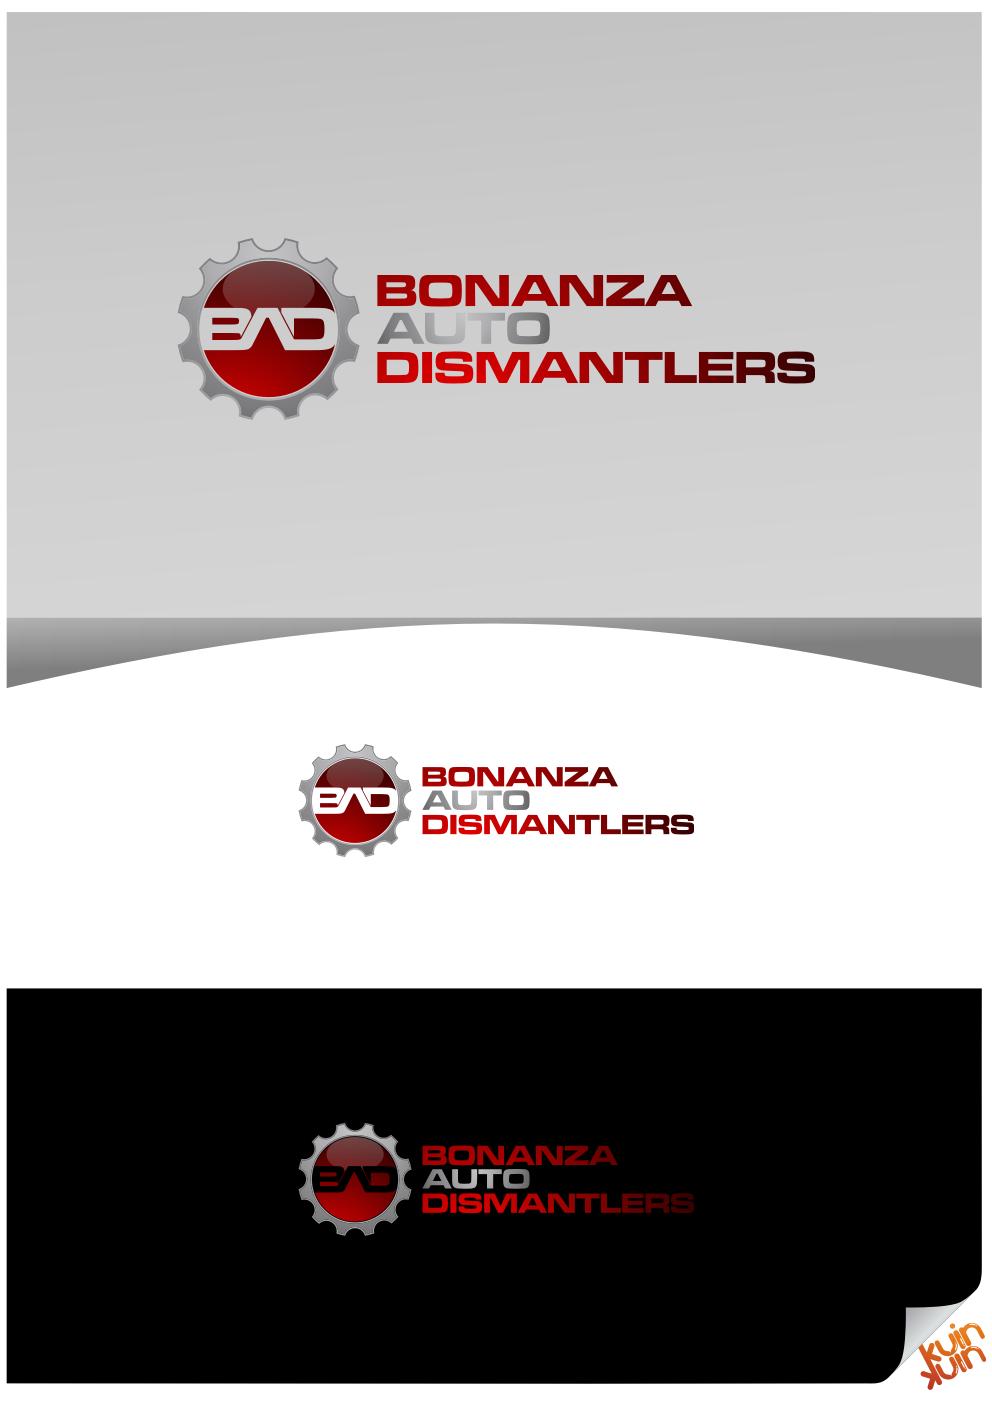 Bonanza Auto Dismantlers